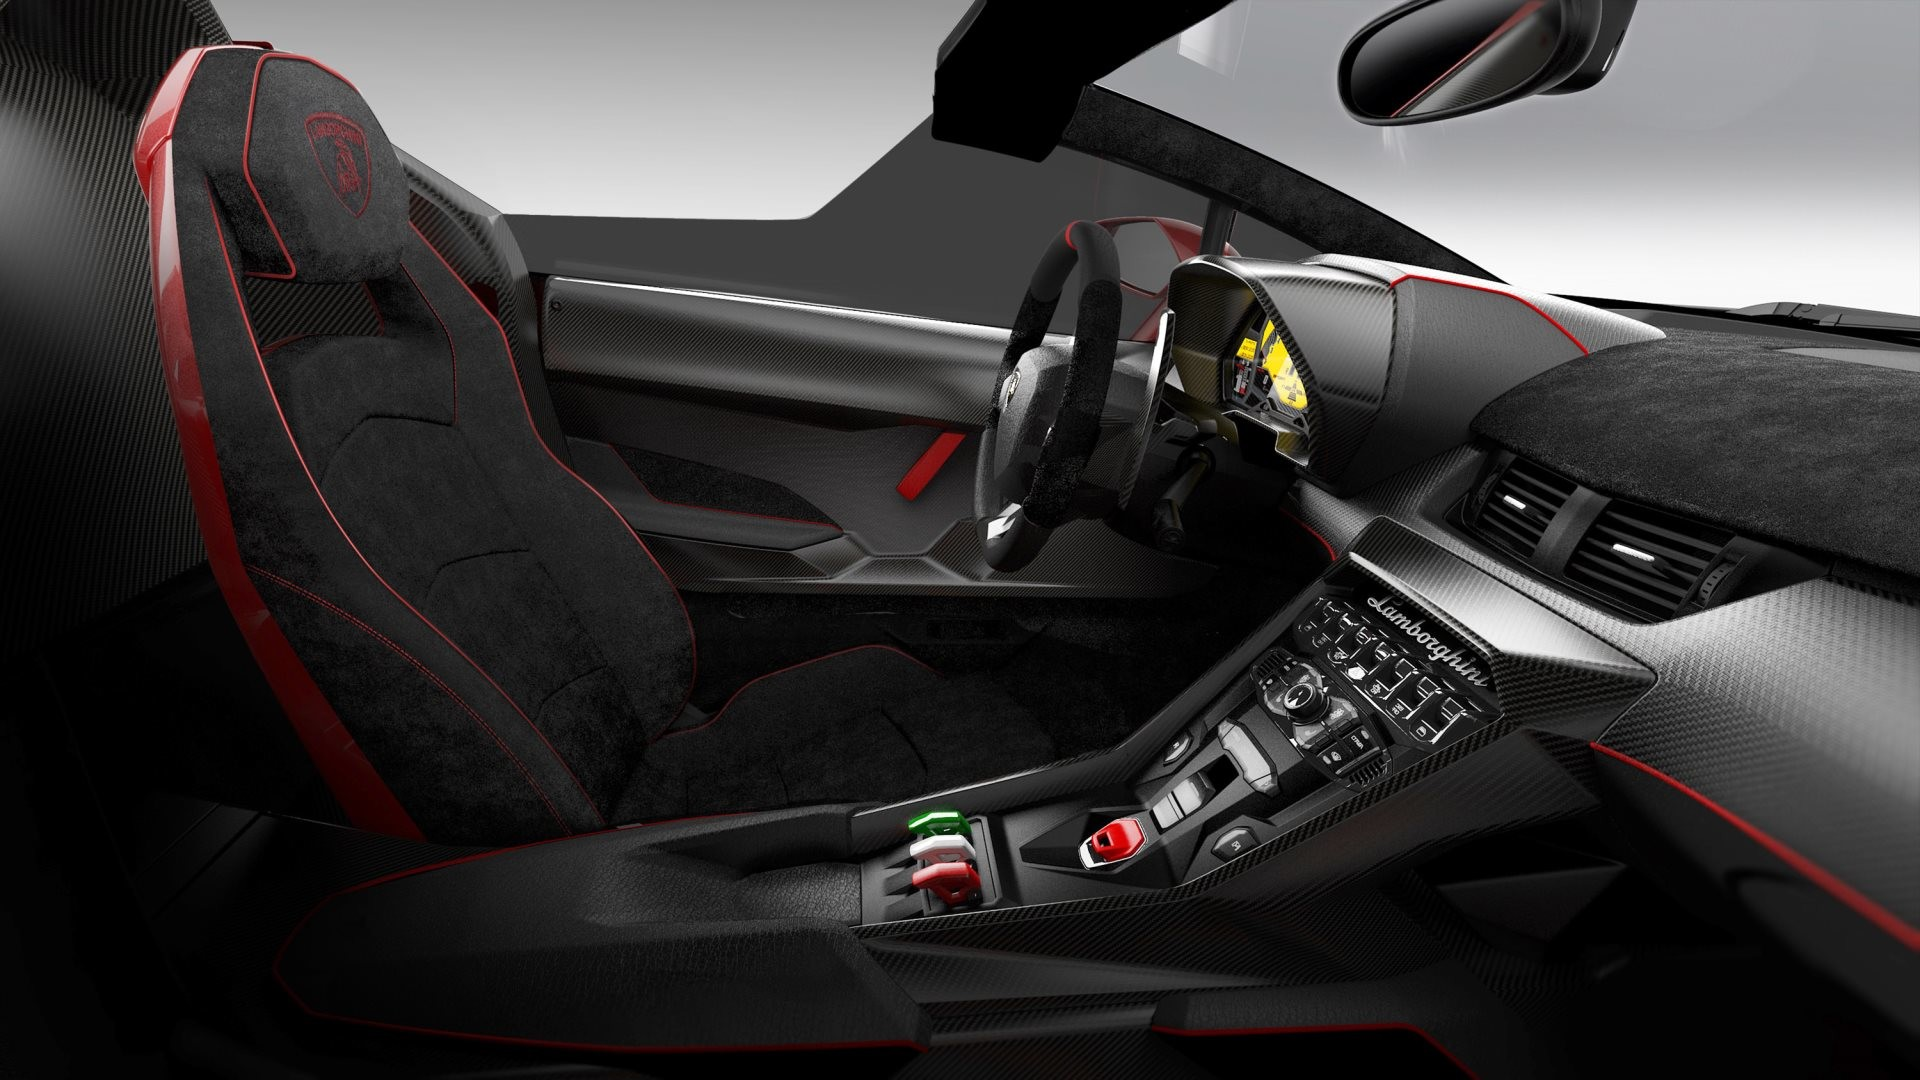 HD Wallpaper 2: Lamborghini Veneno Roadster